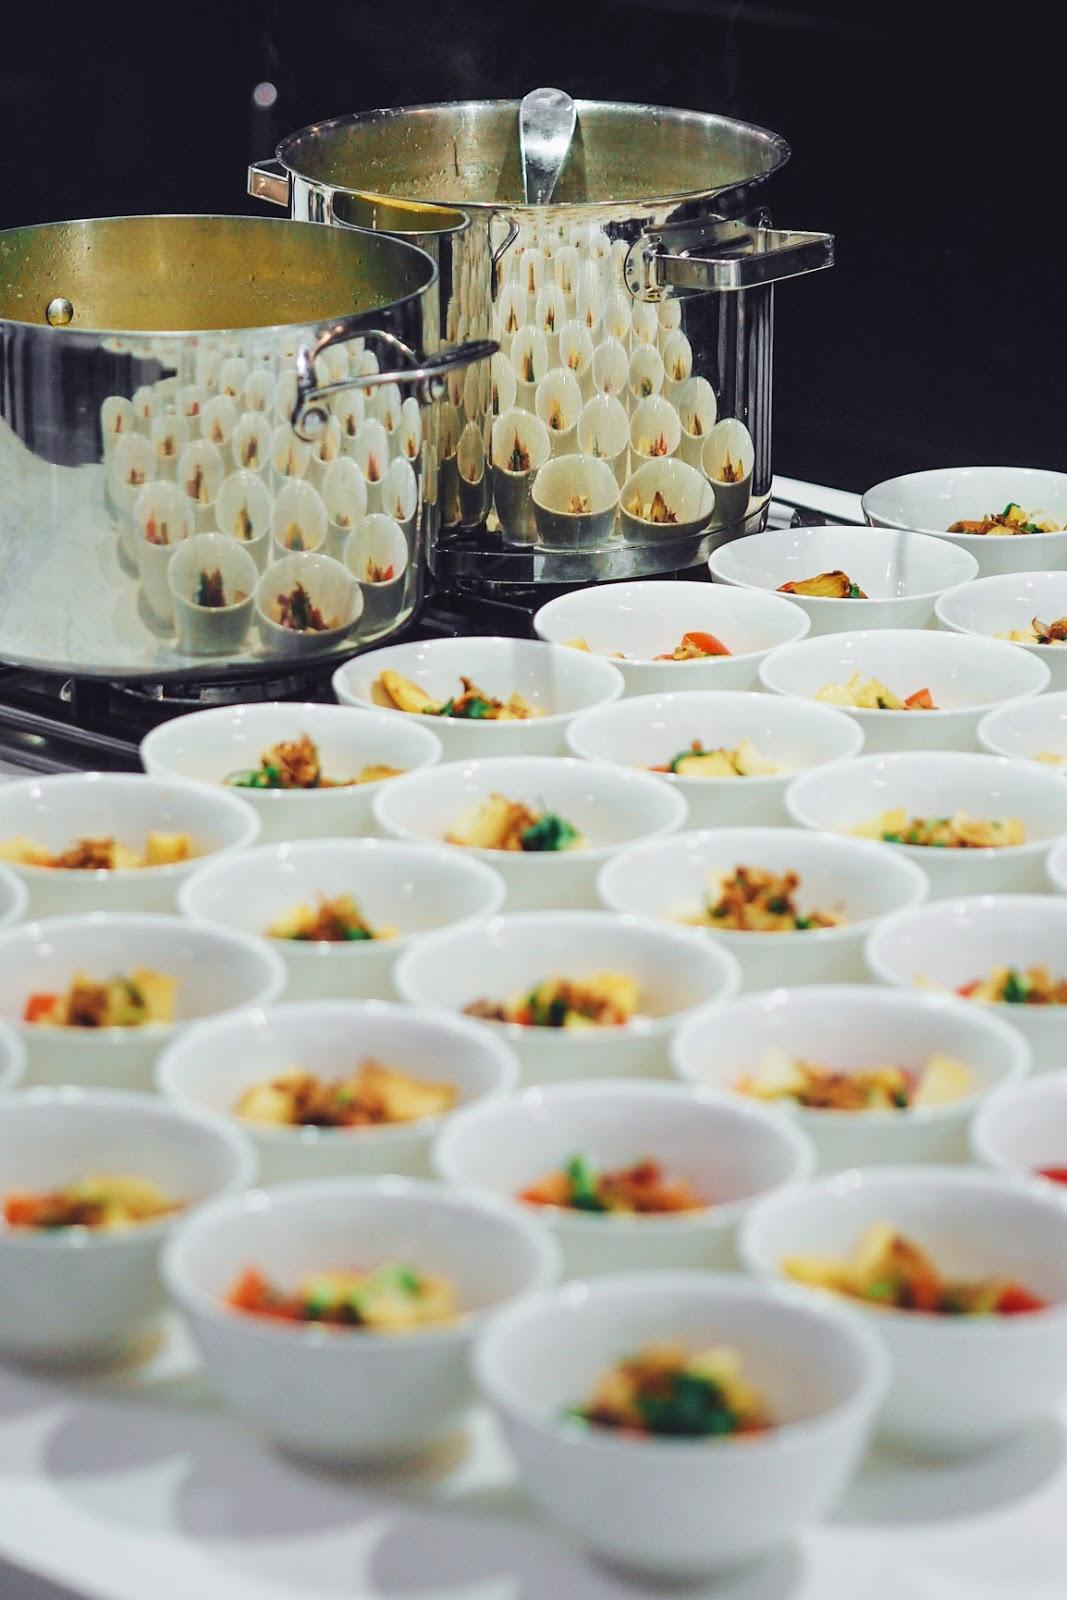 Kuliner Indonesia Kaya Web Launching And Breakfasting Portal Bj